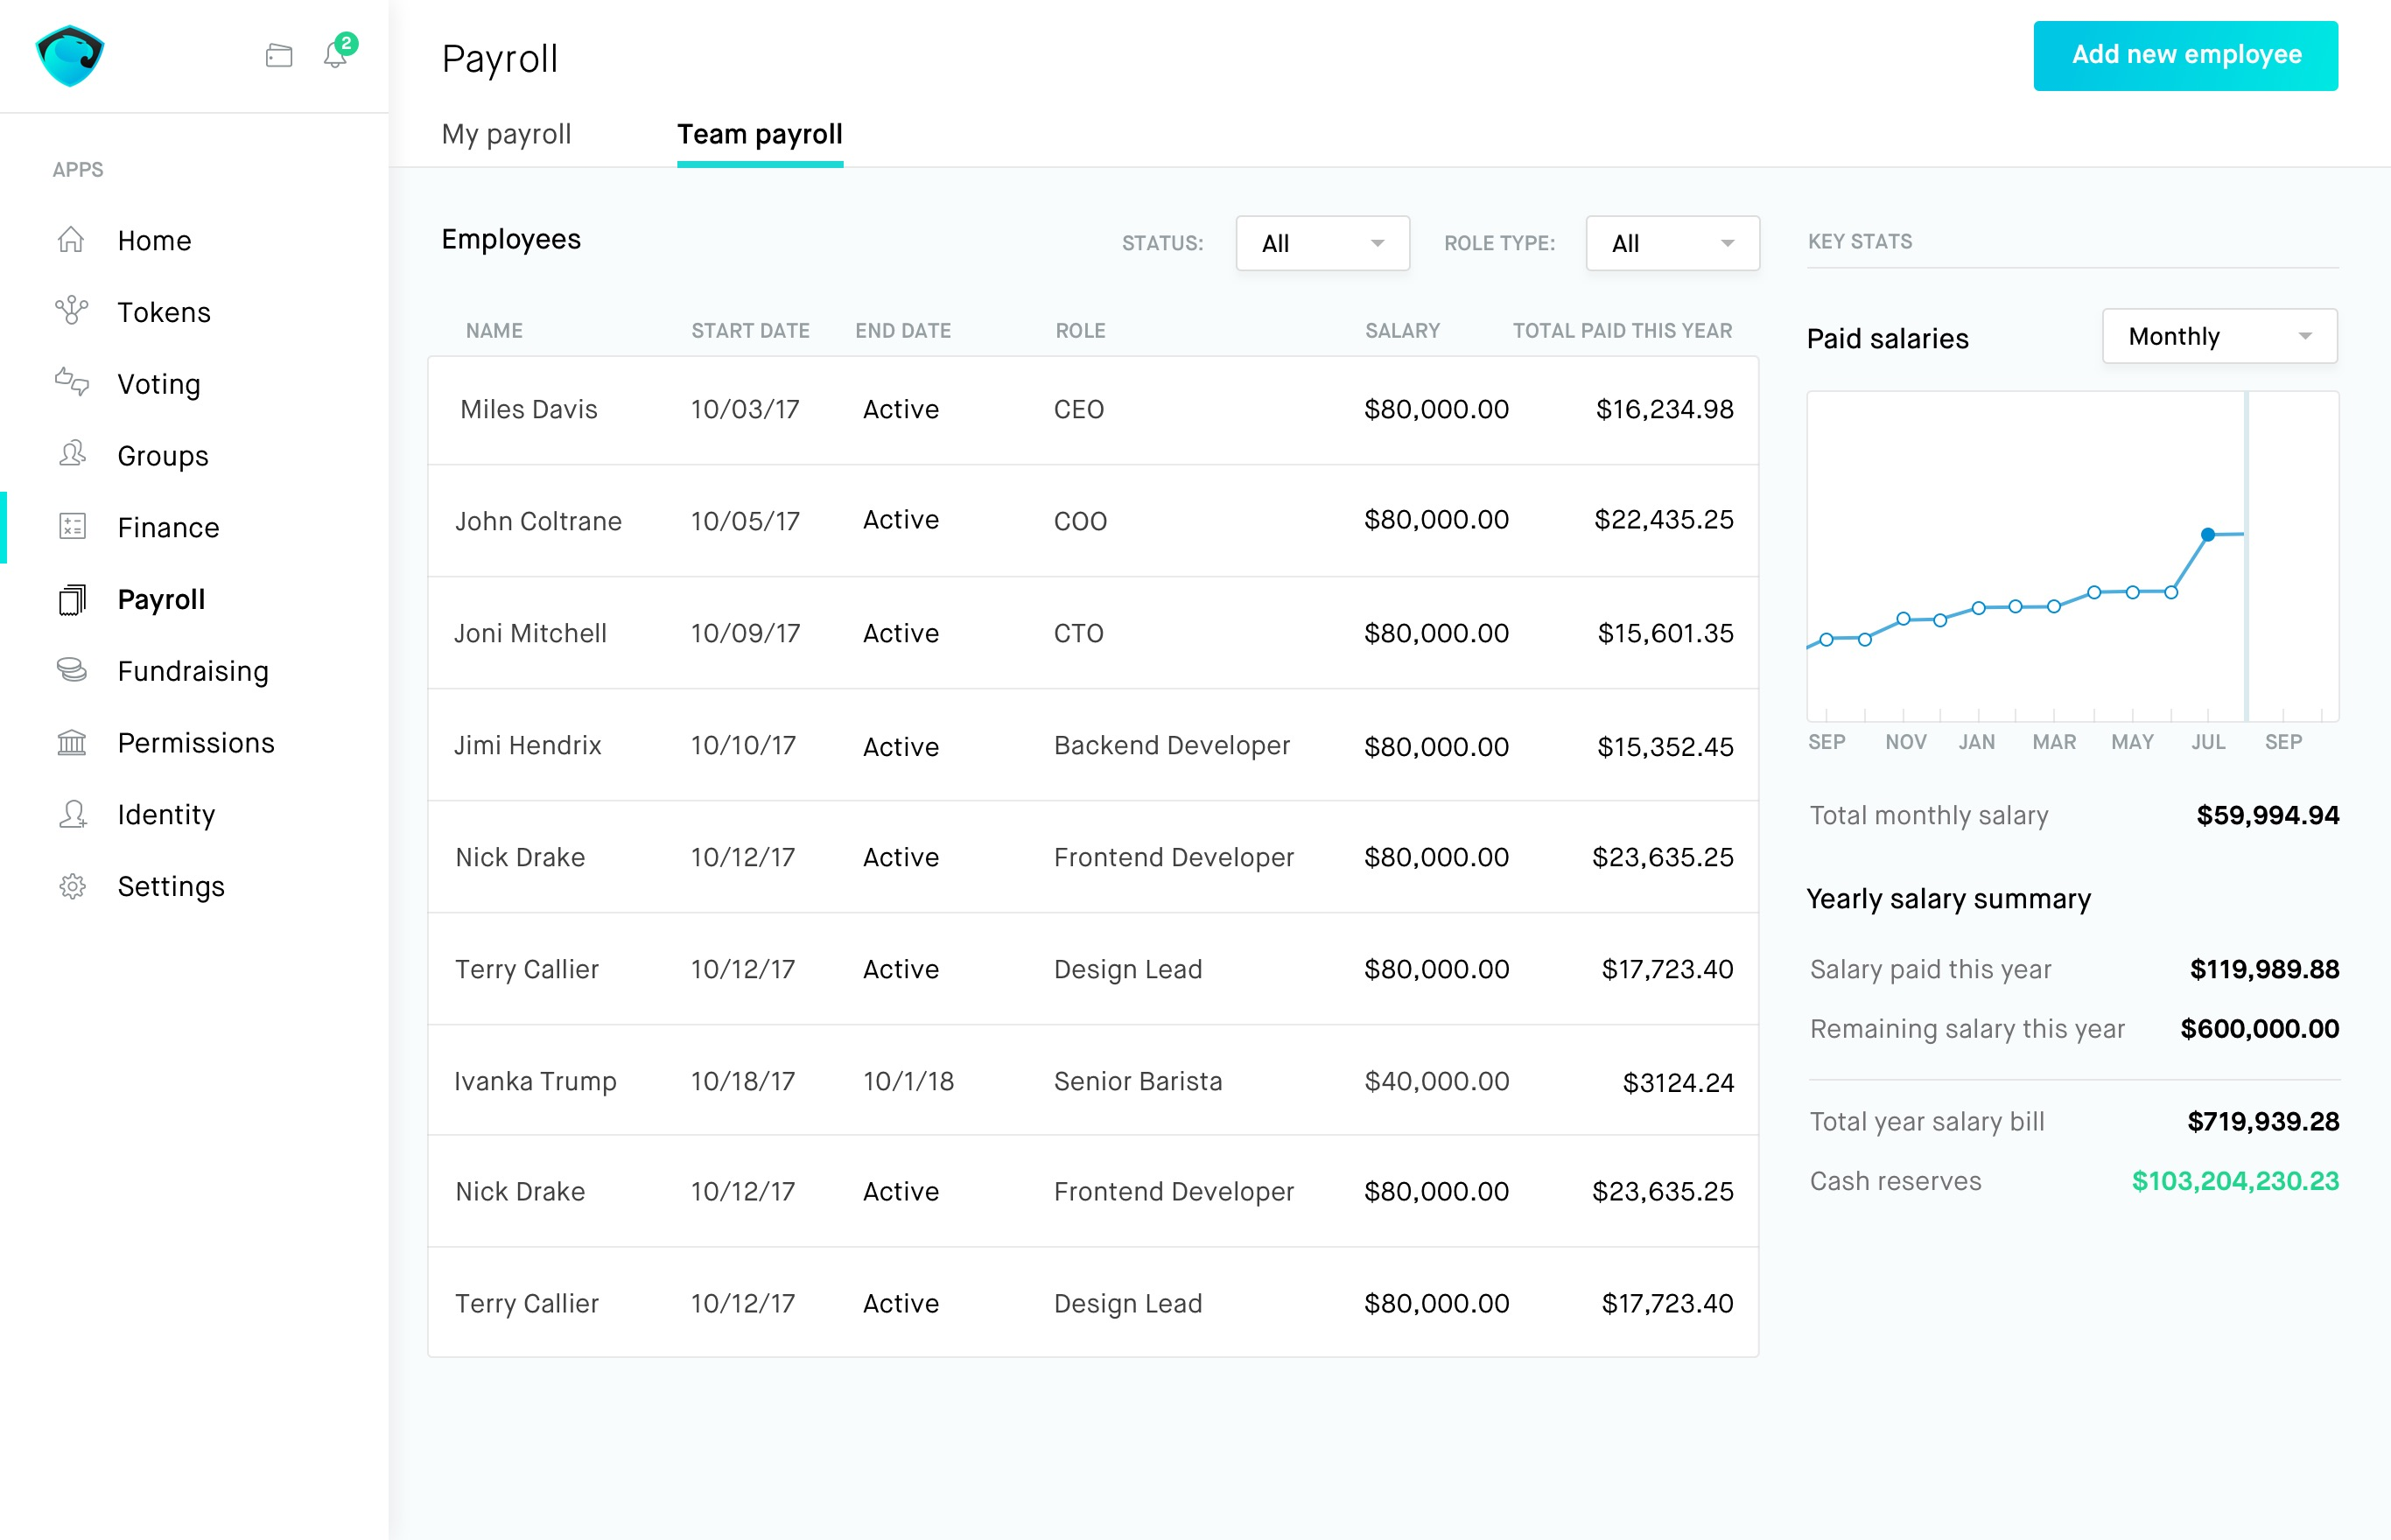 webapp-1366px - finance payroll - team payroll option 2 2x